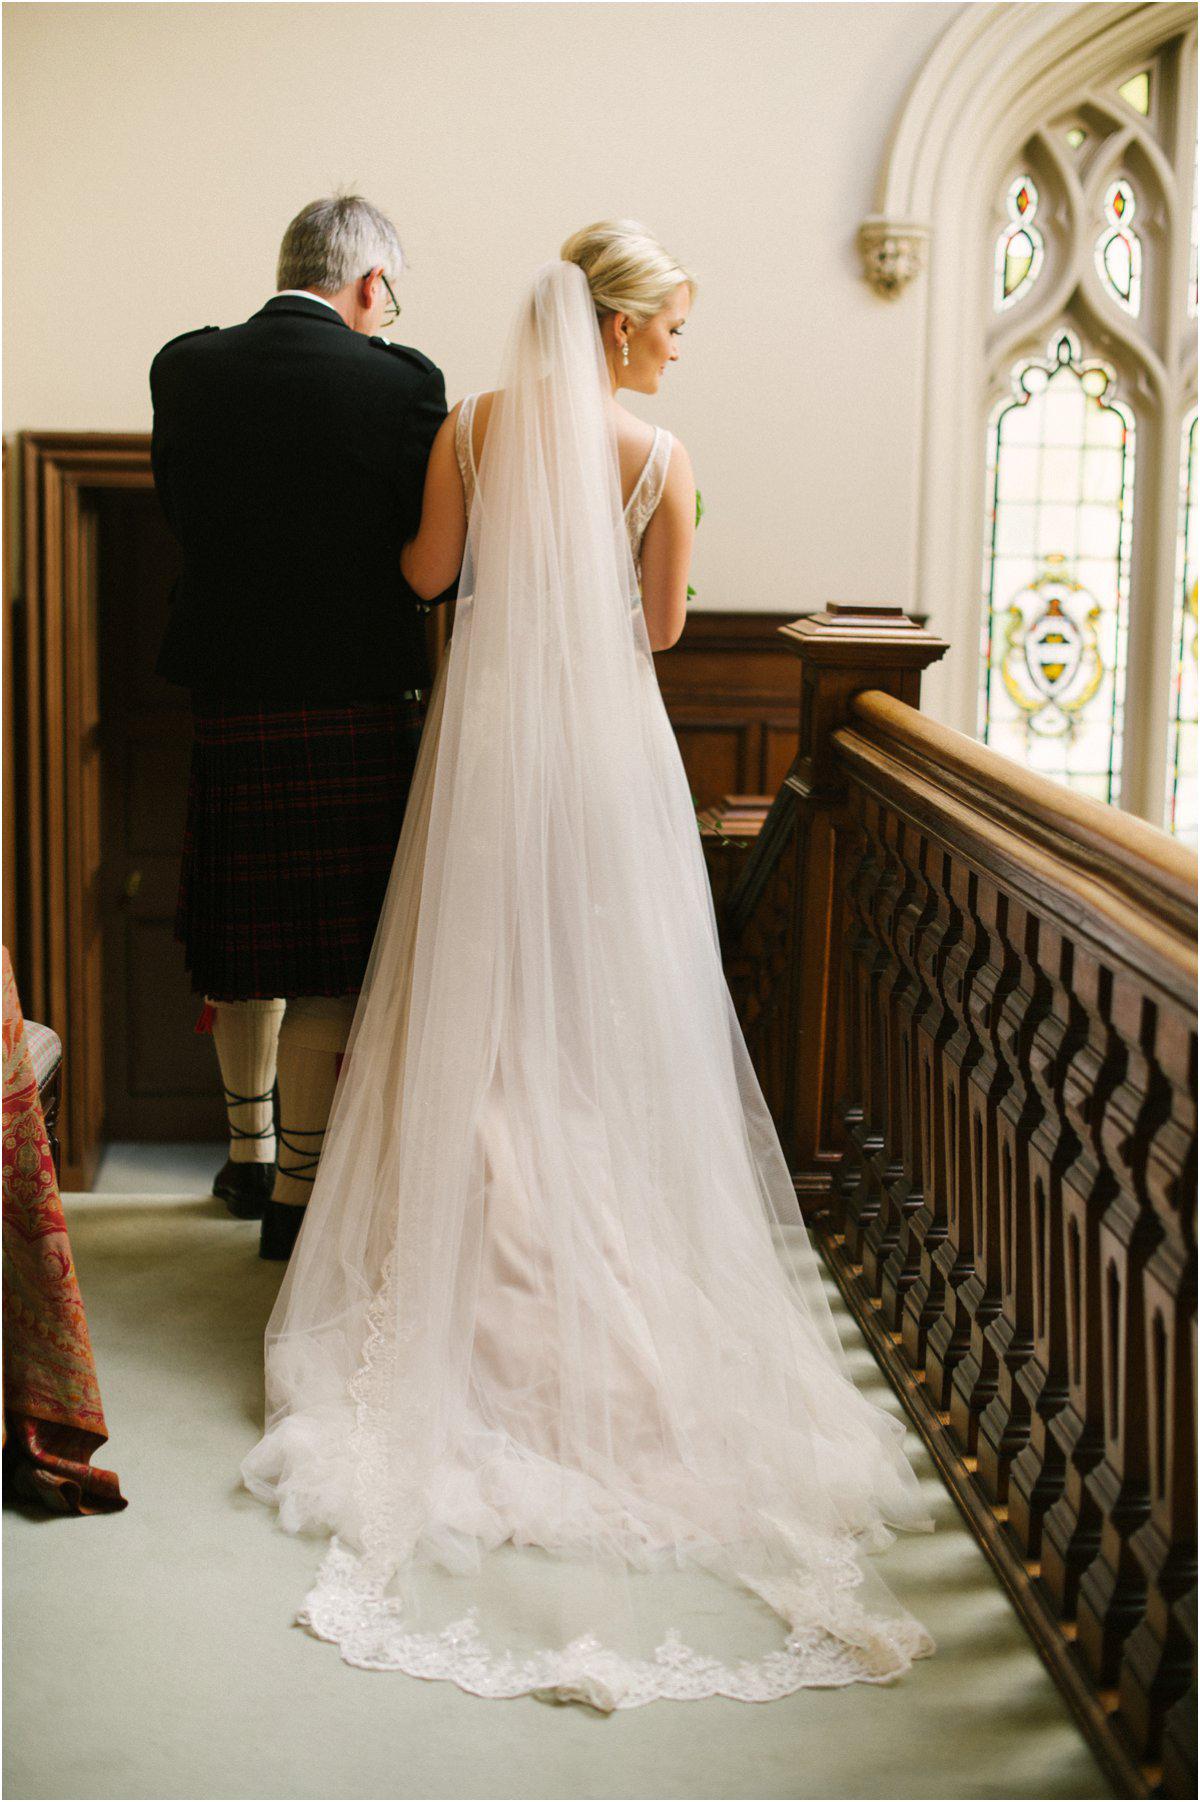 Crofts&Kowalczyk_DundasCastle_WeddingPhotography_Hannah&Tom-31.jpg